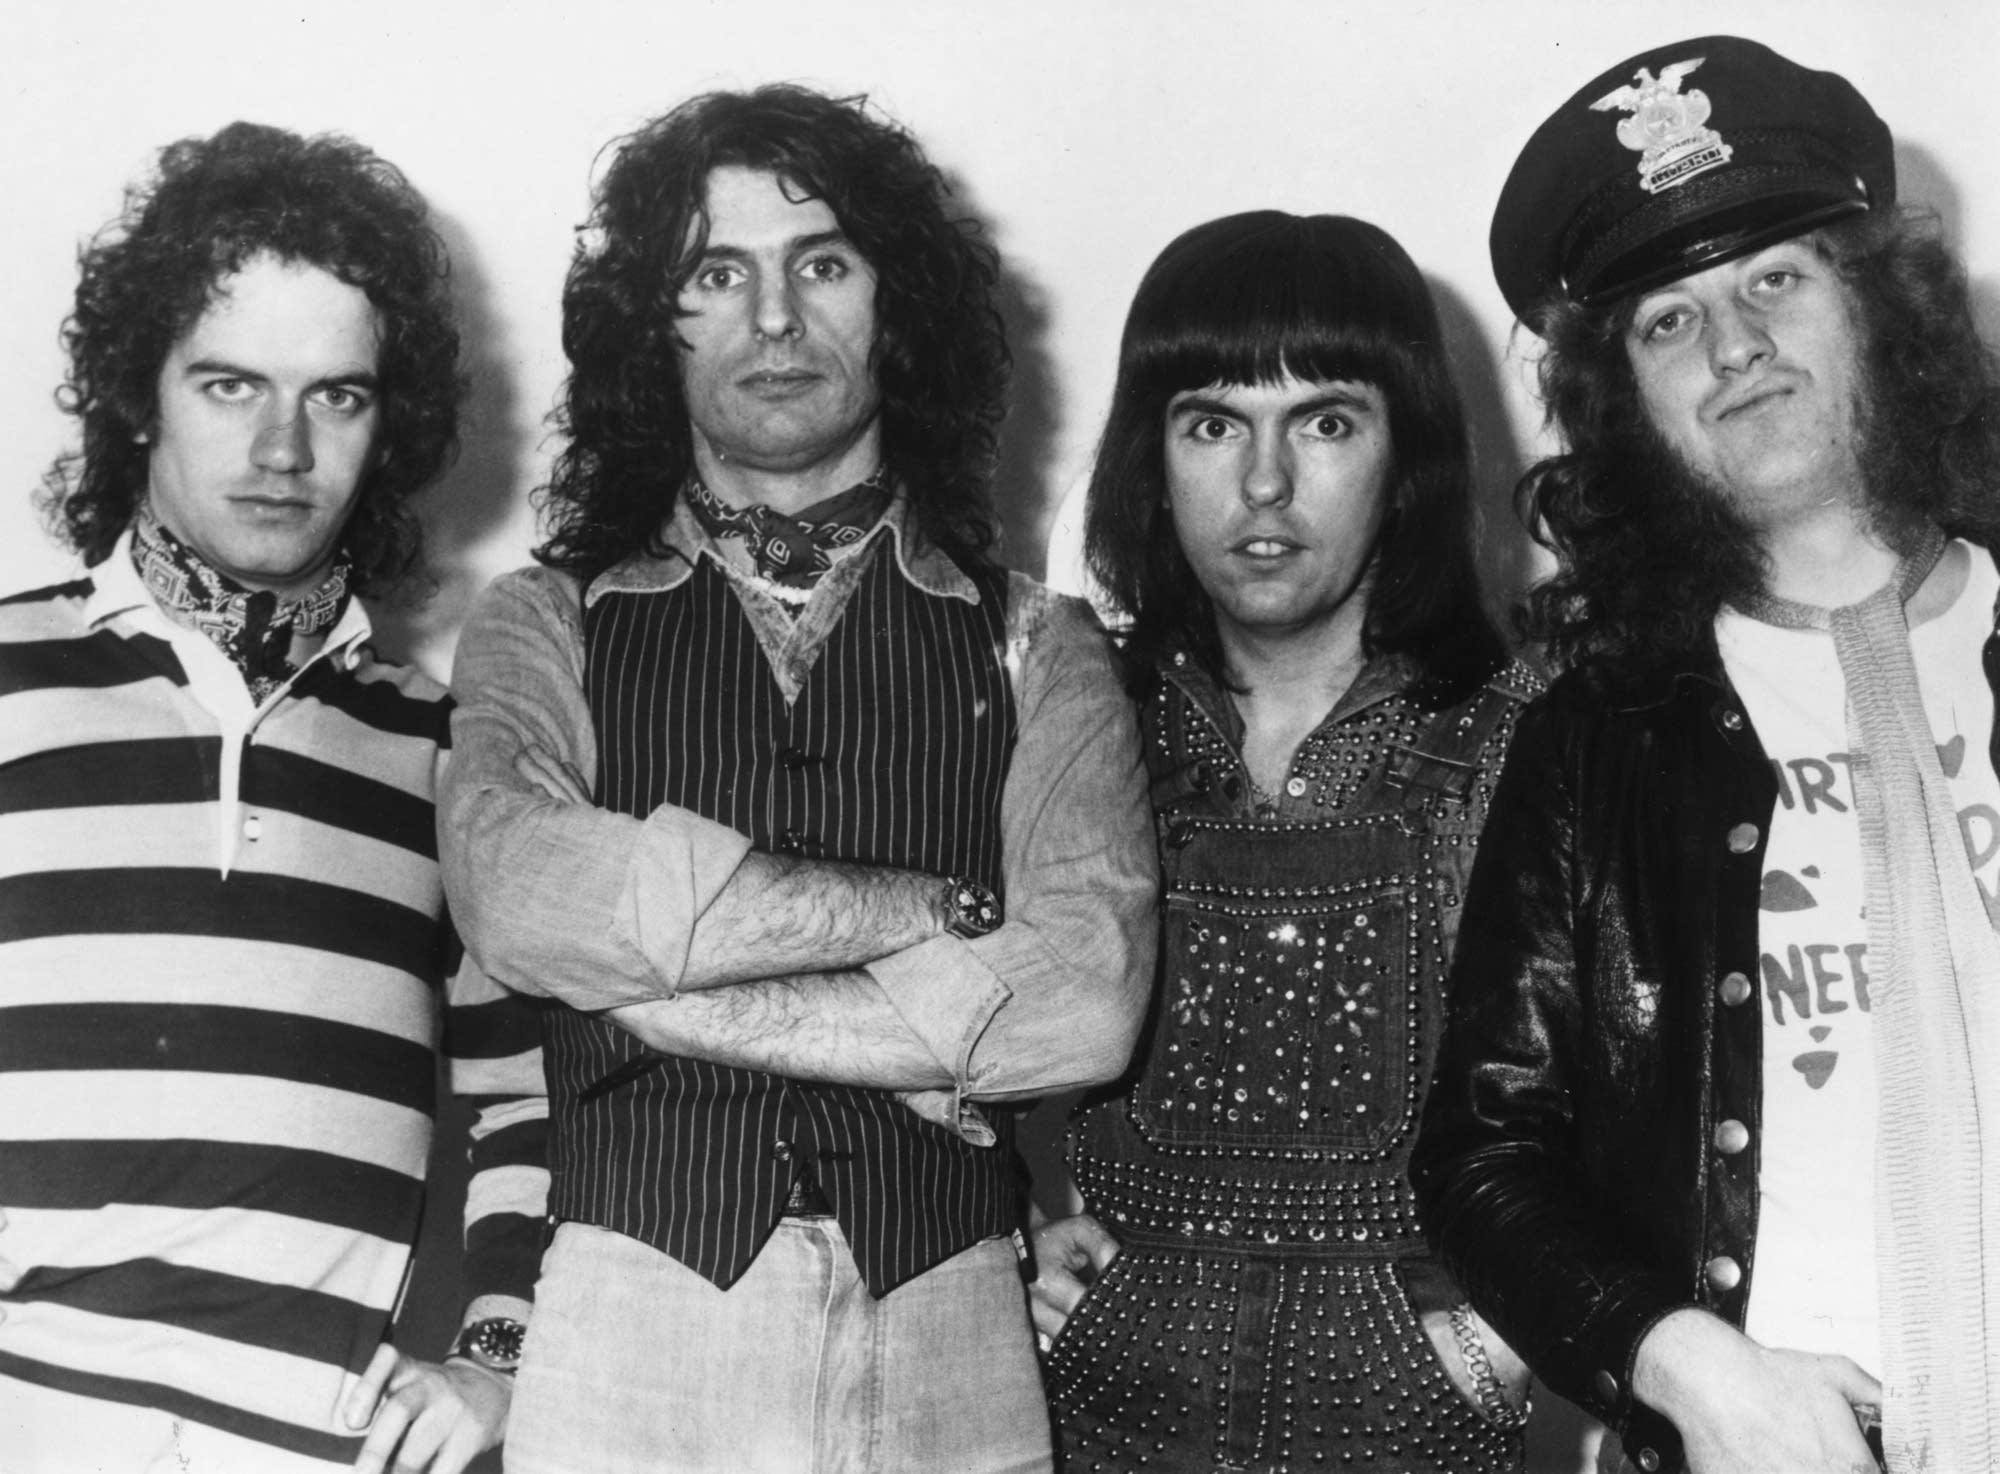 Slade band photo